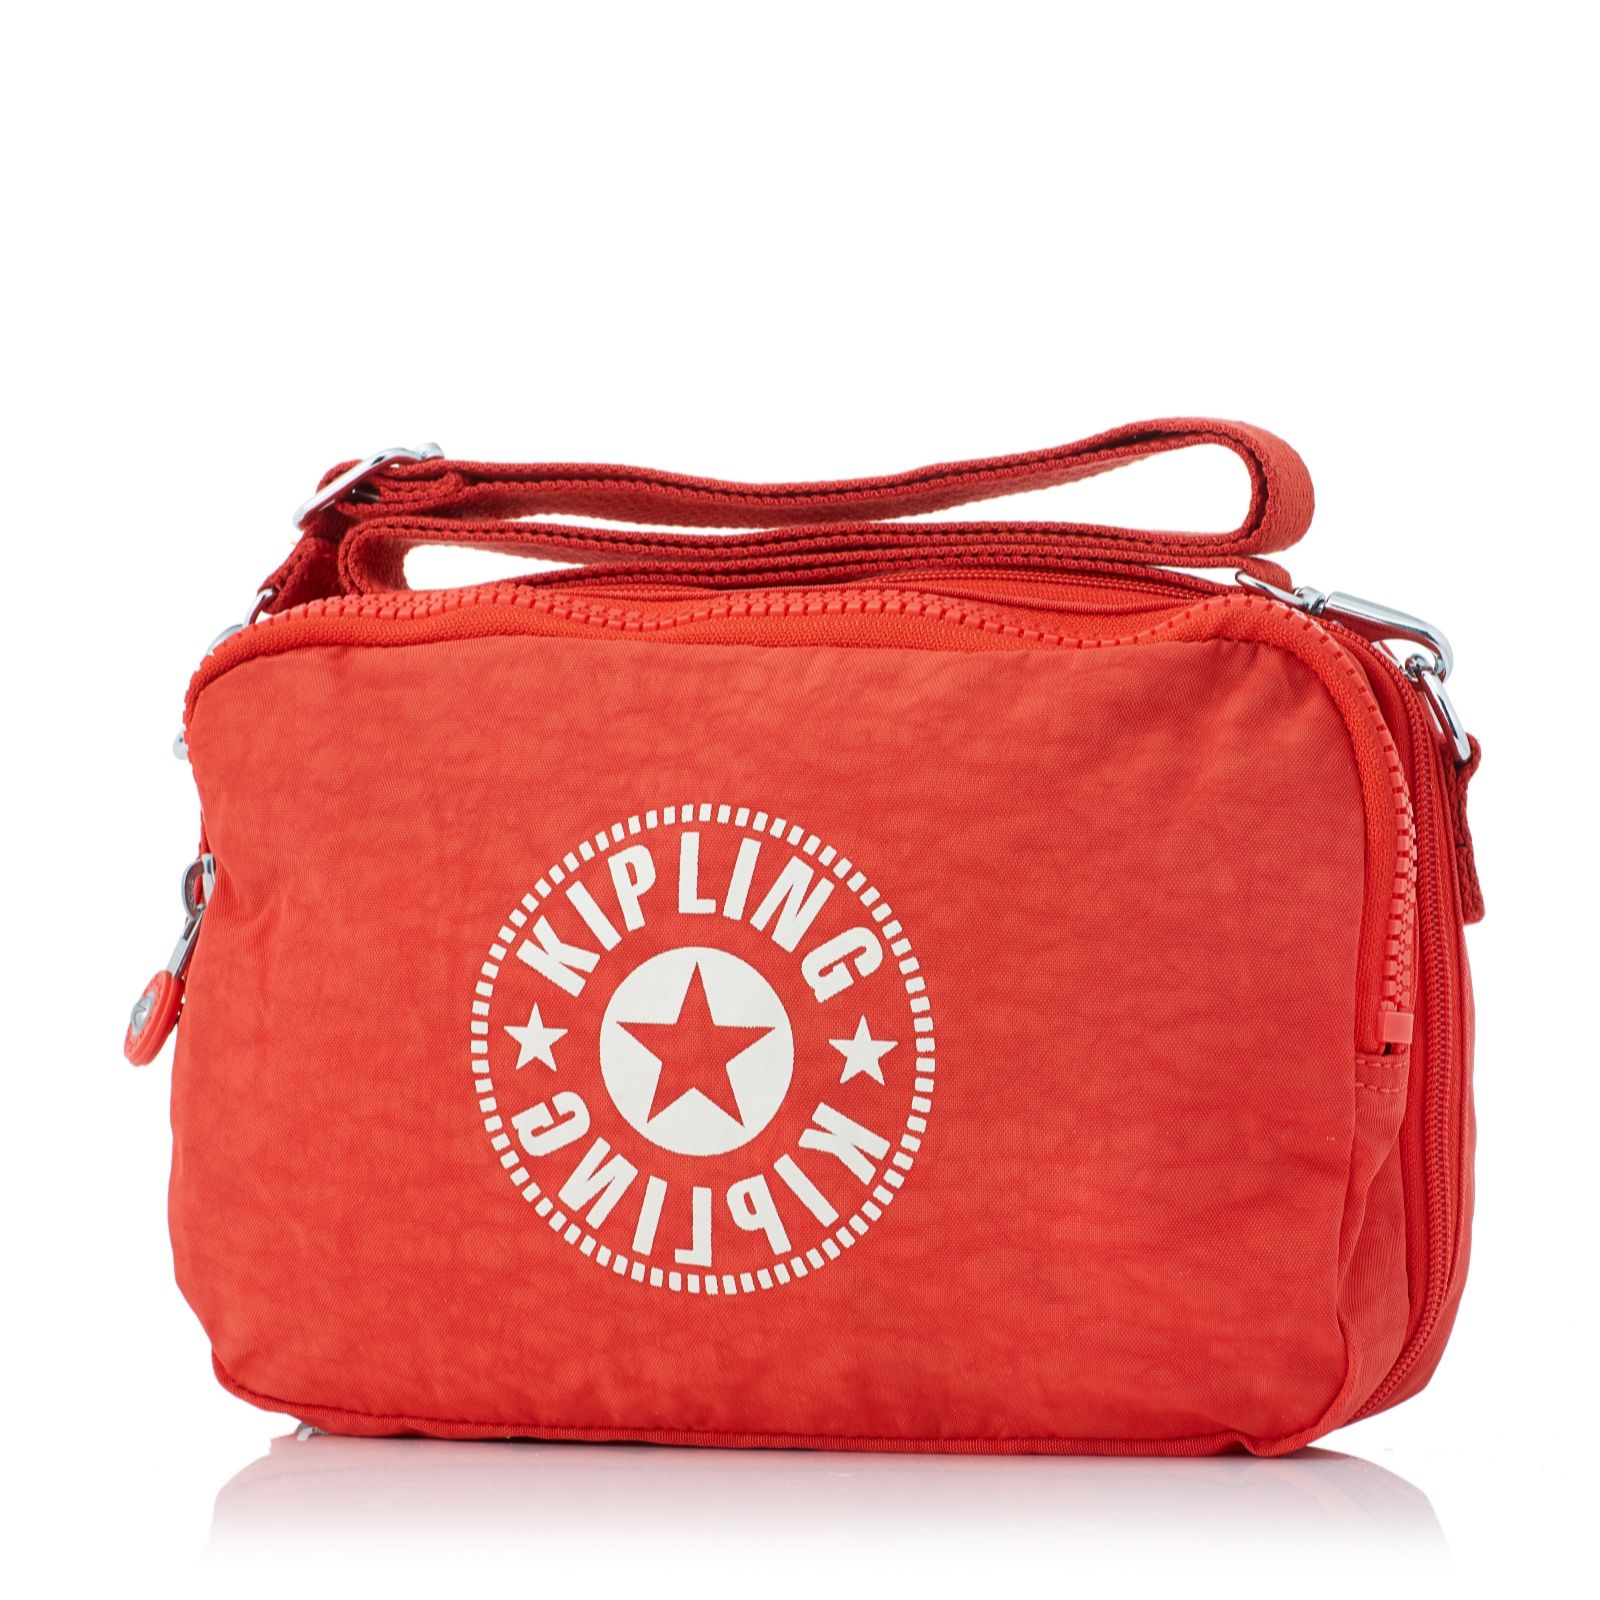 3d704f1ad72 Kipling New Classics Niman Convertible Backpack to Crossbody Bag ...